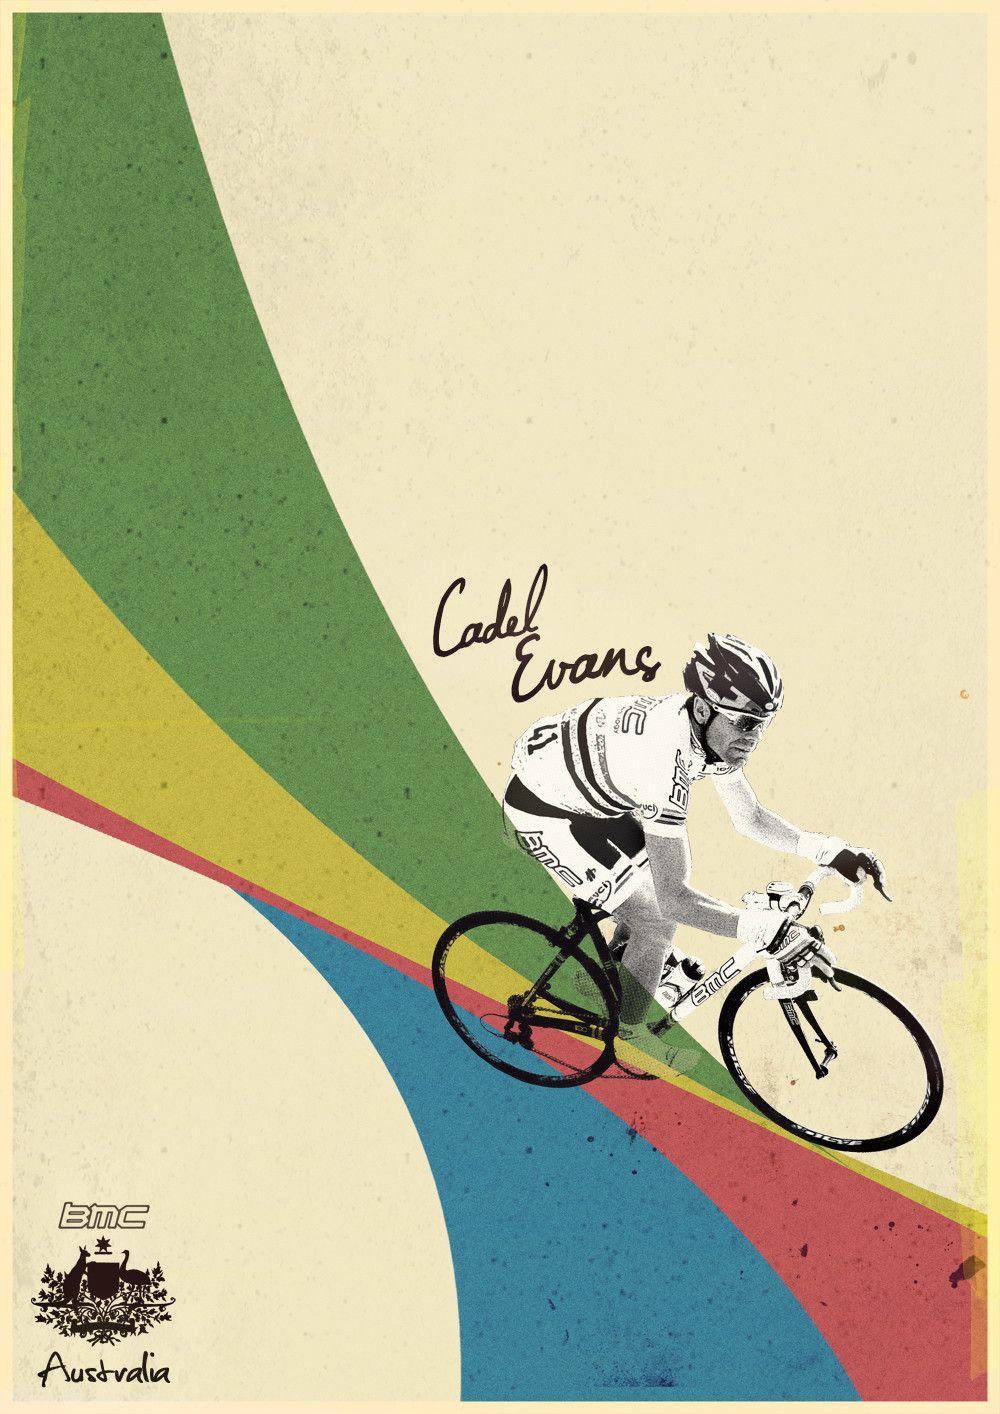 Graphics Com Forums Reviews And Critiques 8 Retro Style Vintage Cycling Post Retro Bike Illustration Cycling Art Illustrations Posters Cycling Posters